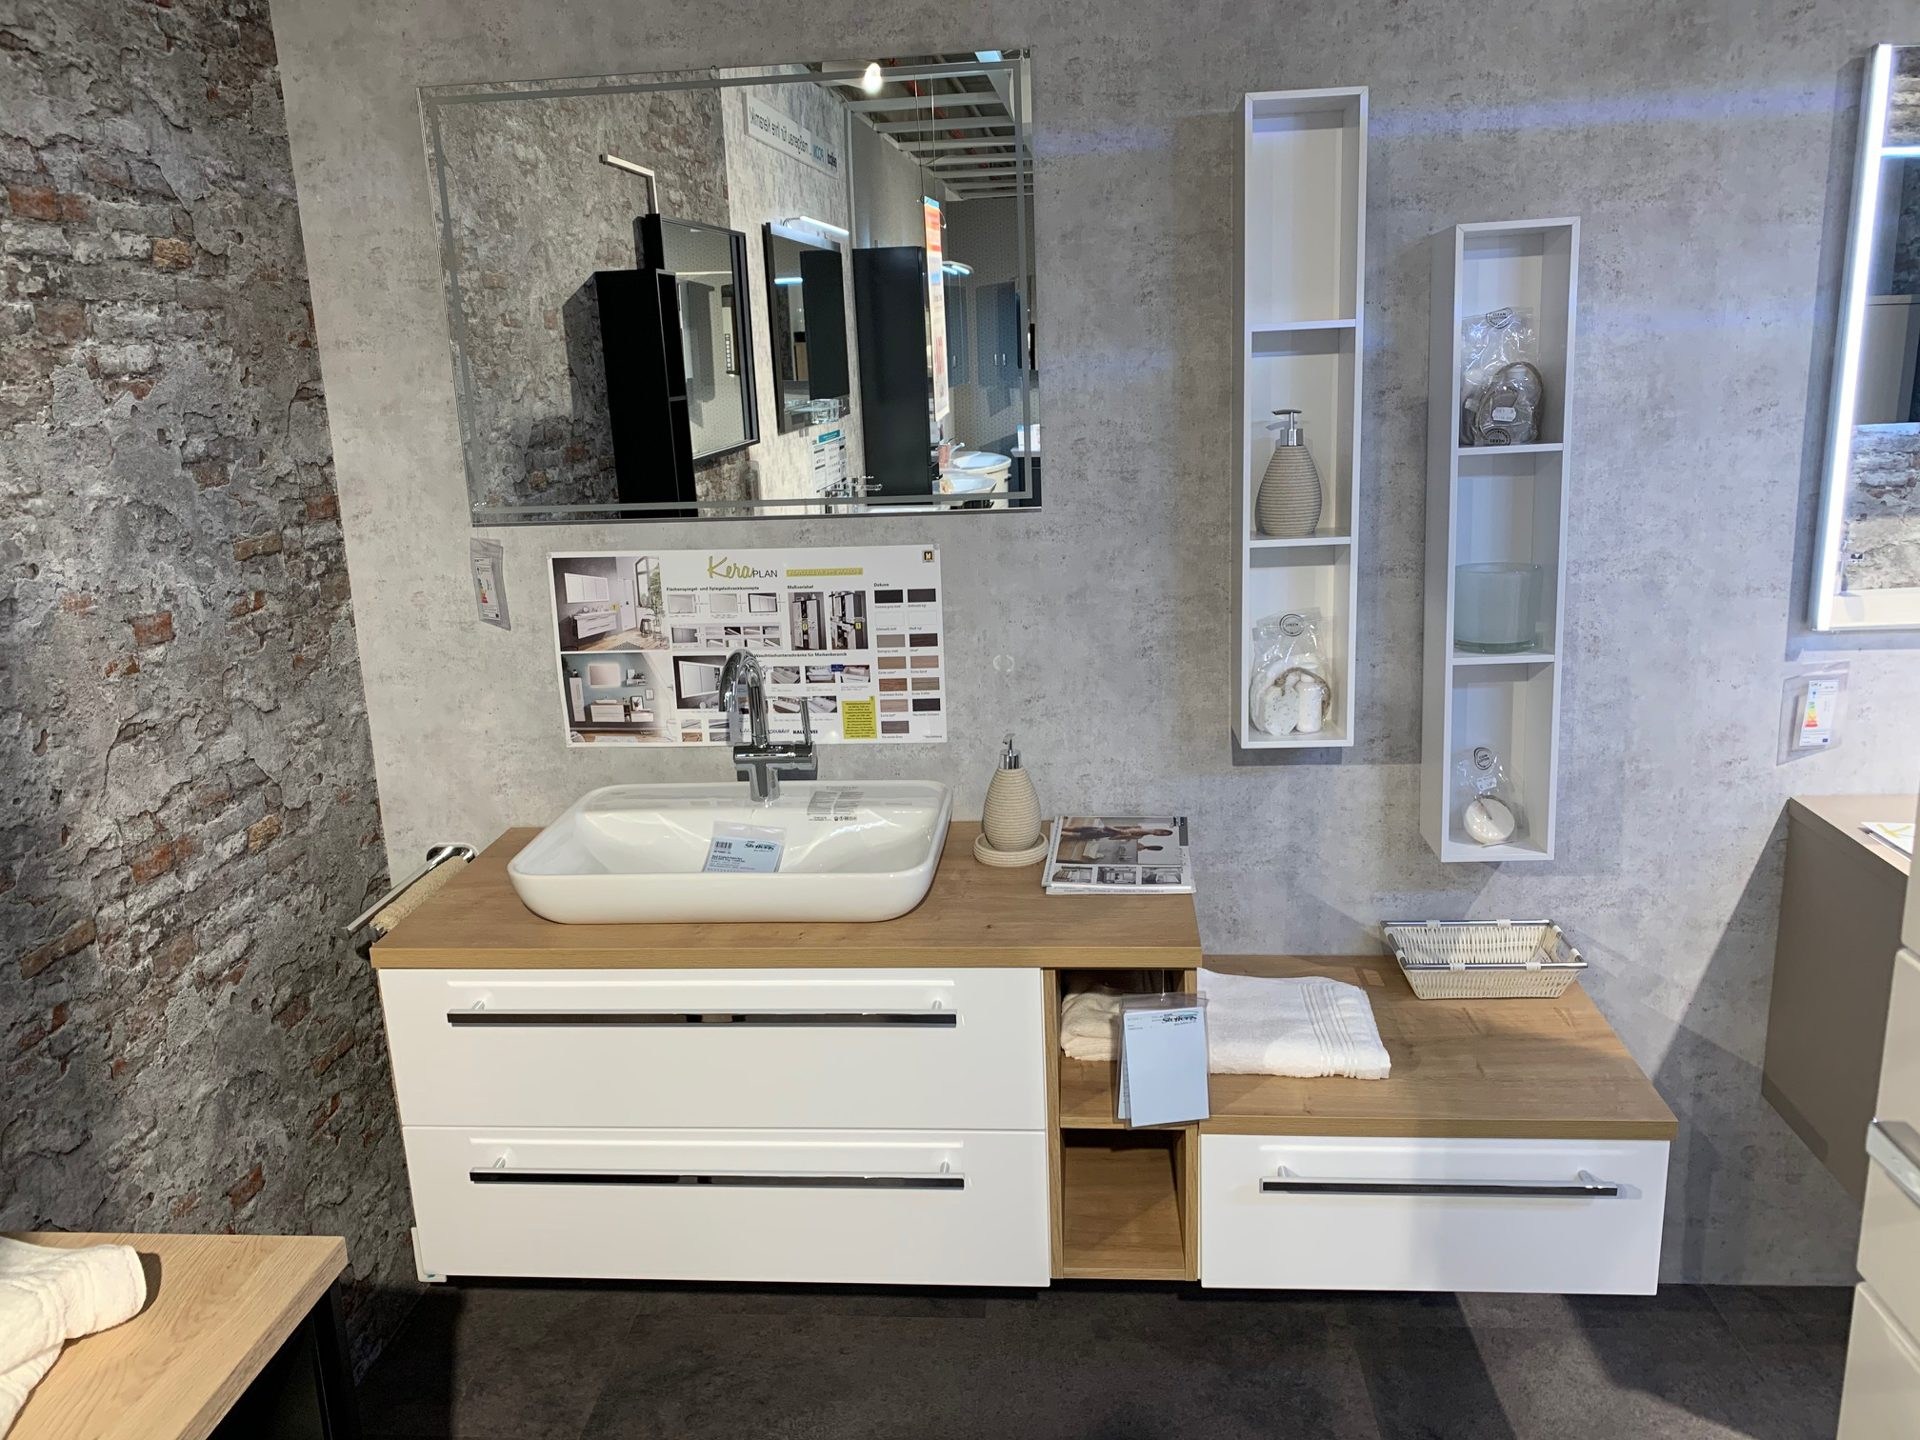 Ausstellungsbad Puris KeraPlan, Lamstedt, Cuxhaven, Bremerhaven